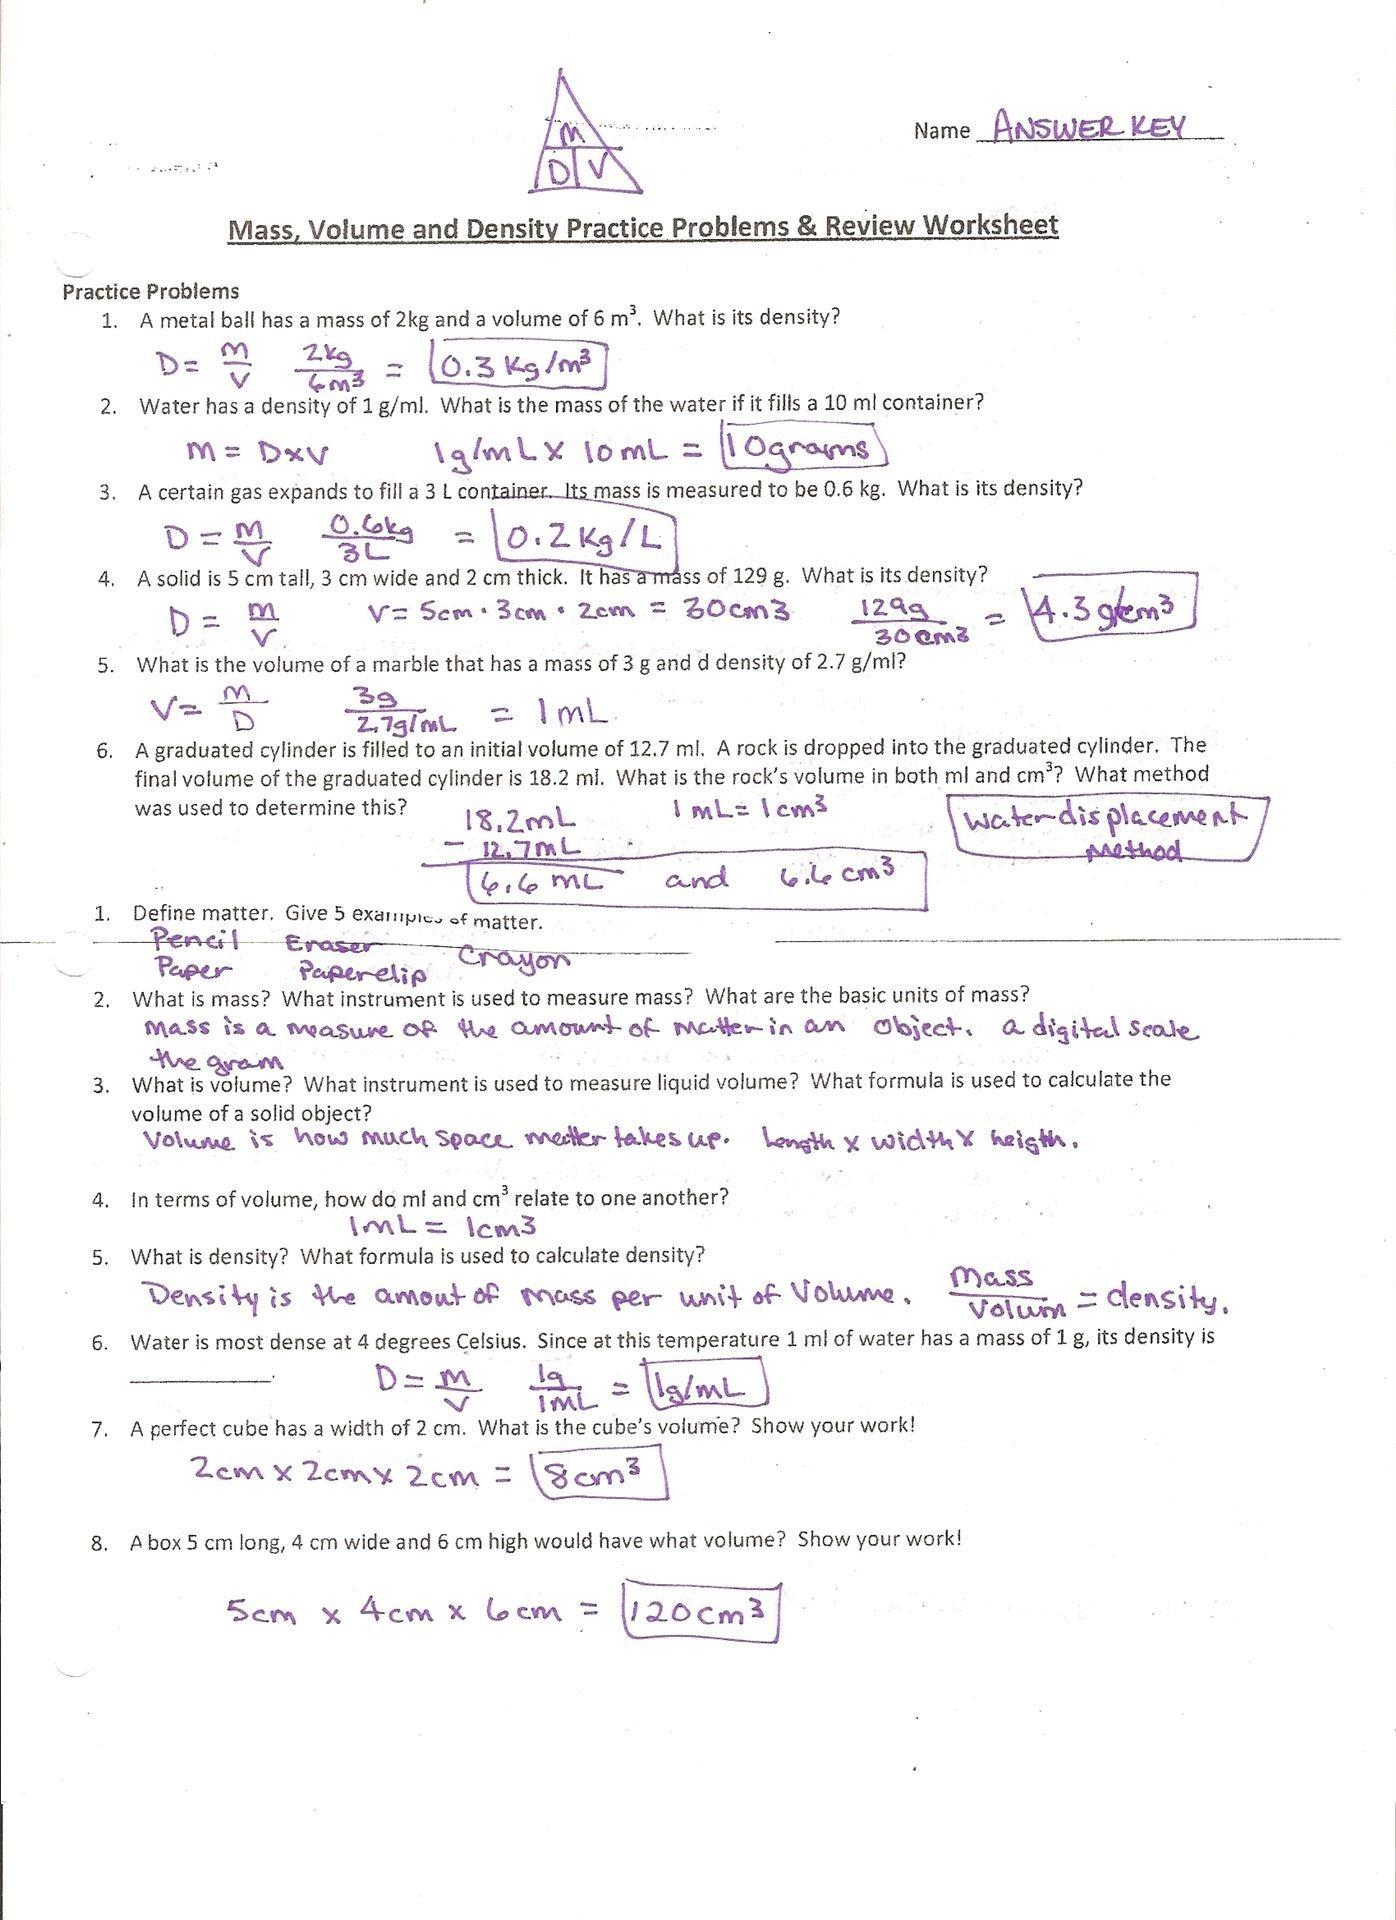 Density Calculations Worksheet 1